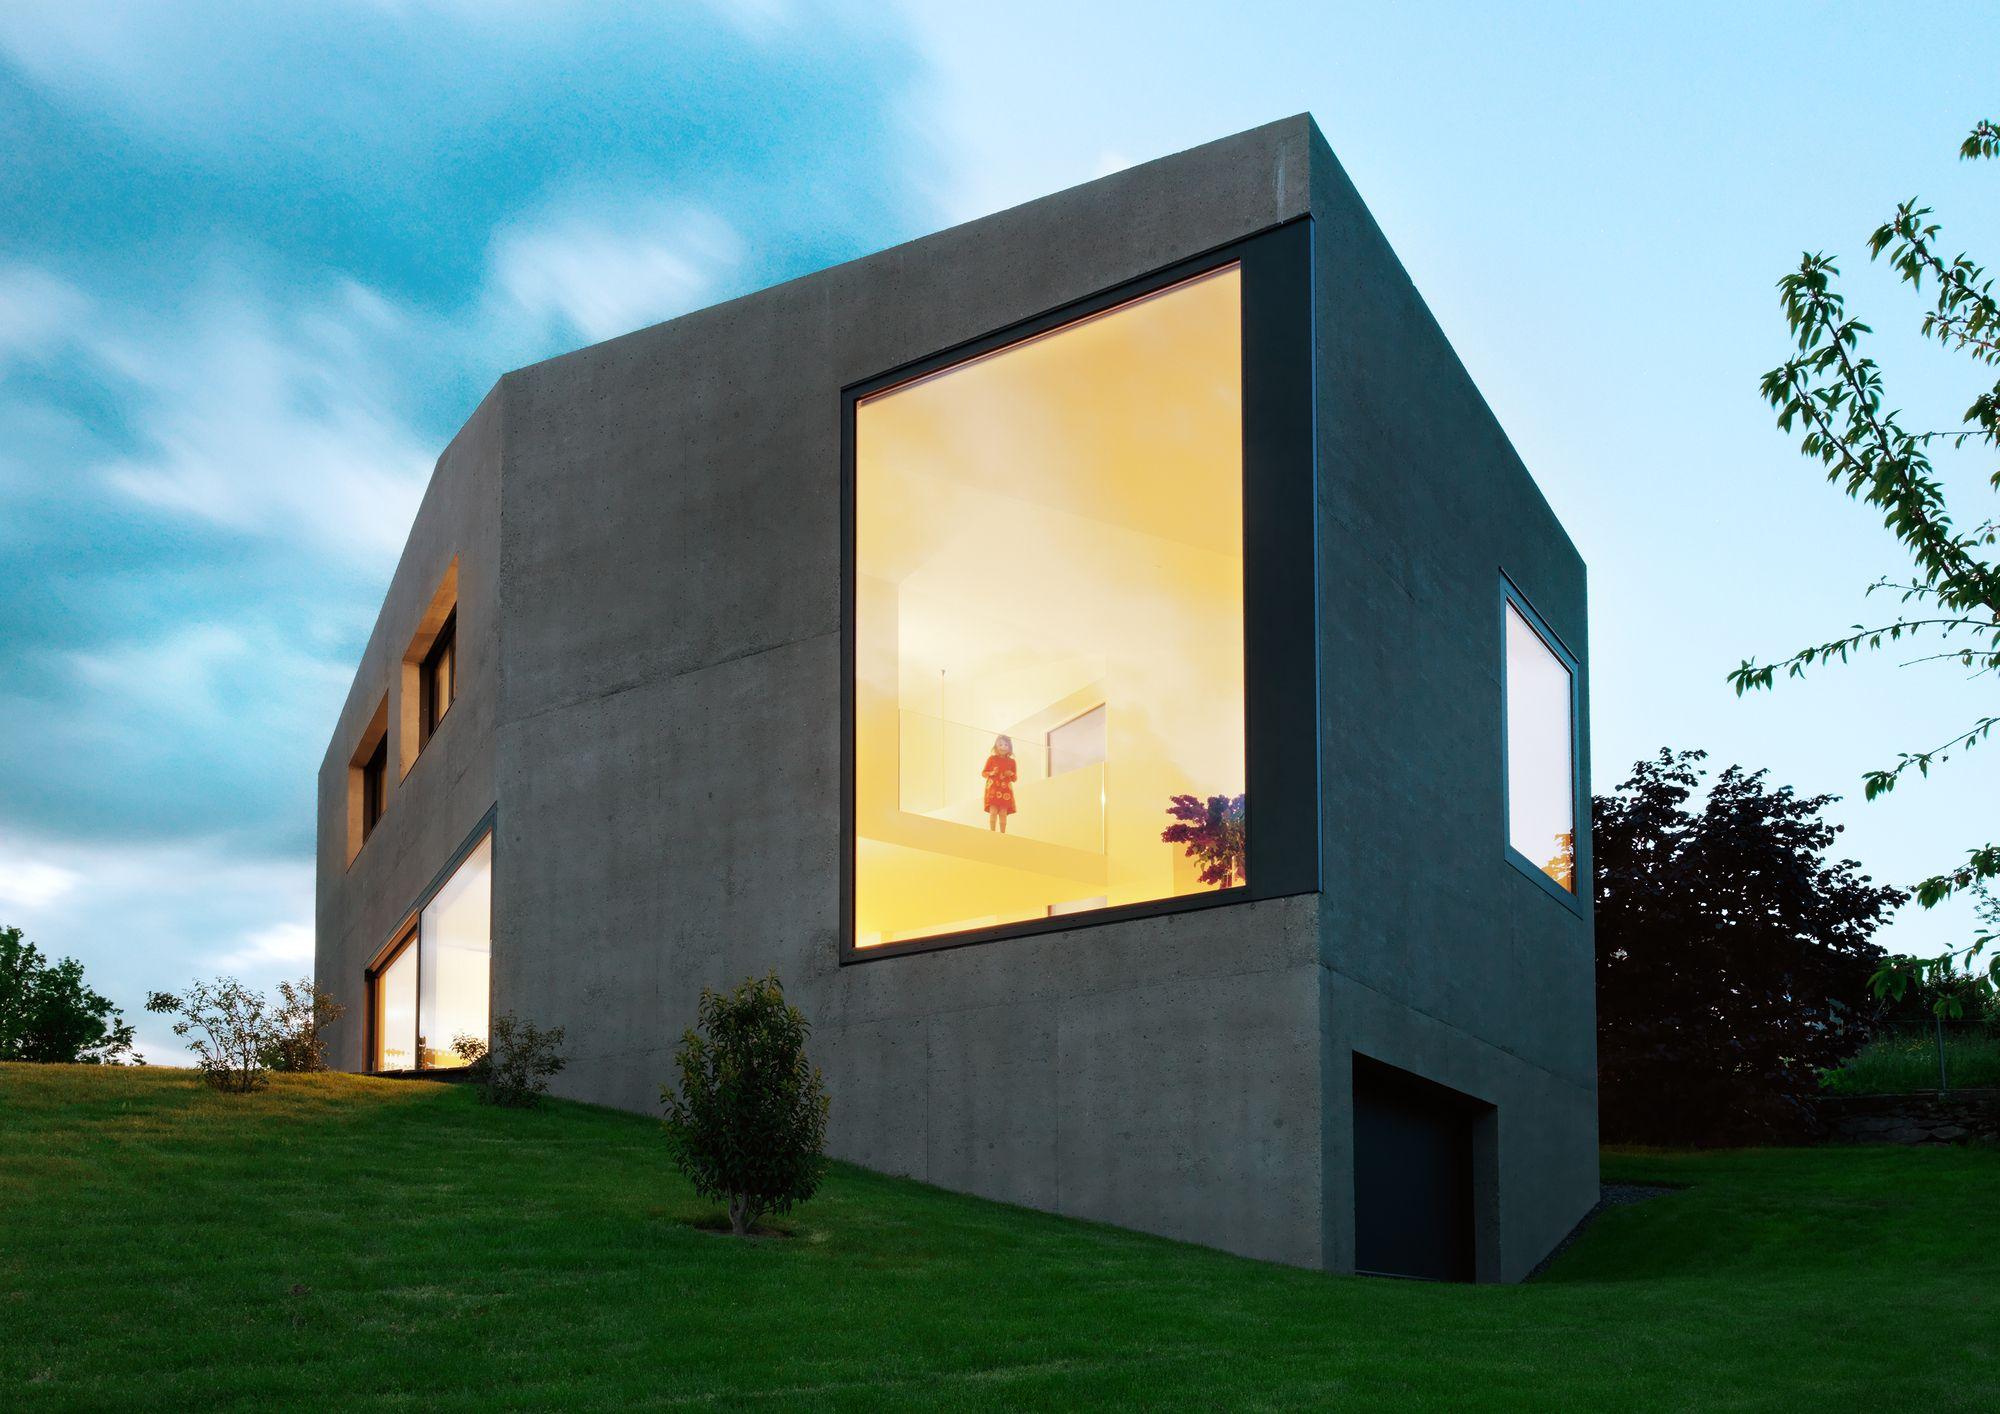 Swiss architekten google zoeken akademi arkitektur for Architect zoeken